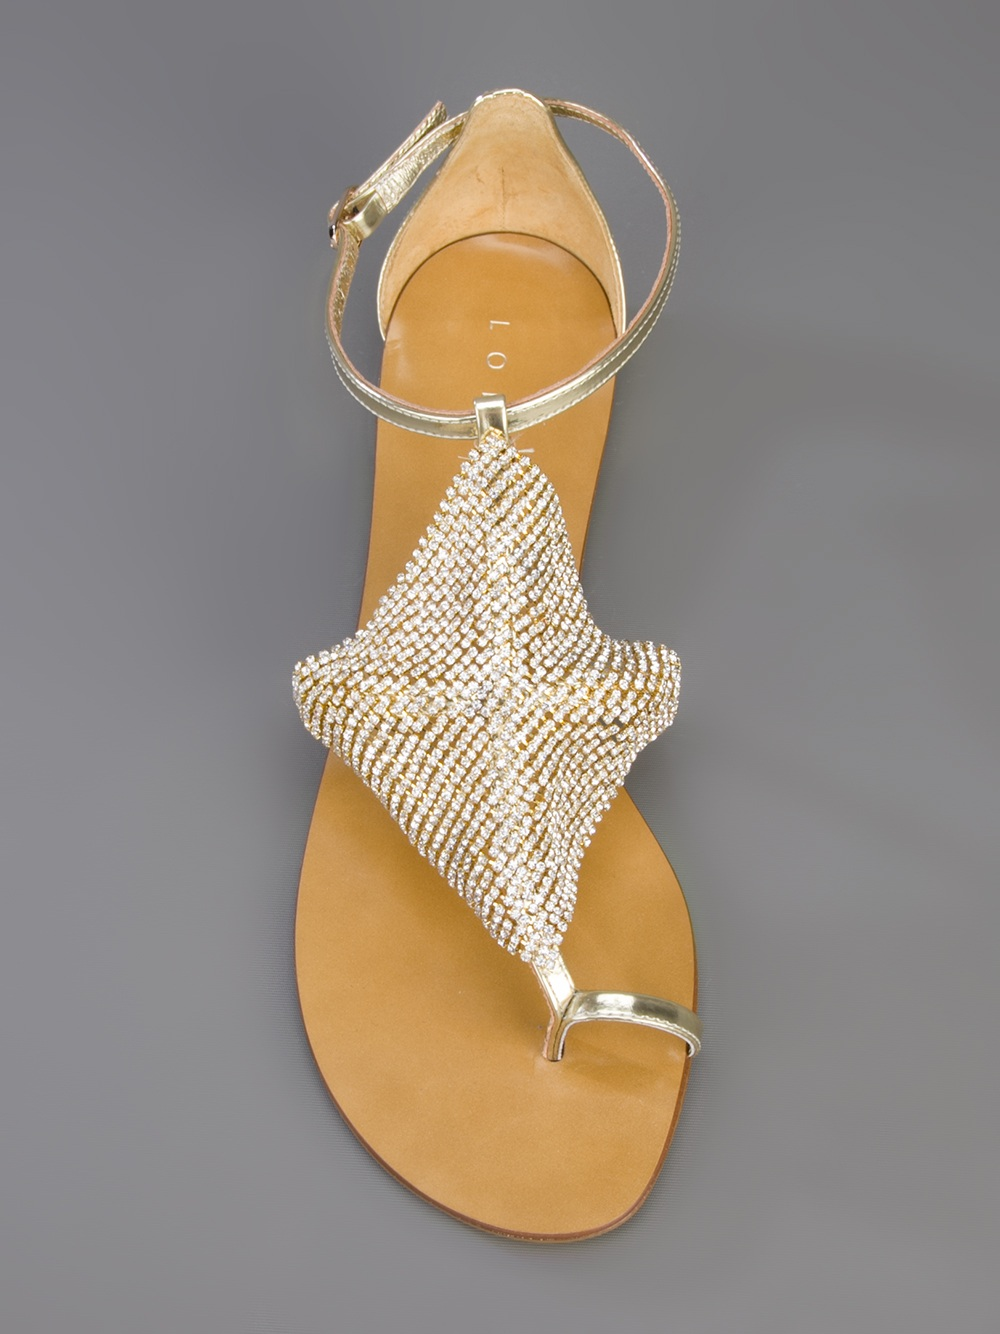 Professional  Buy Cheap View Lola Cruz Bead embellished sandals 7iKgQW2dLm